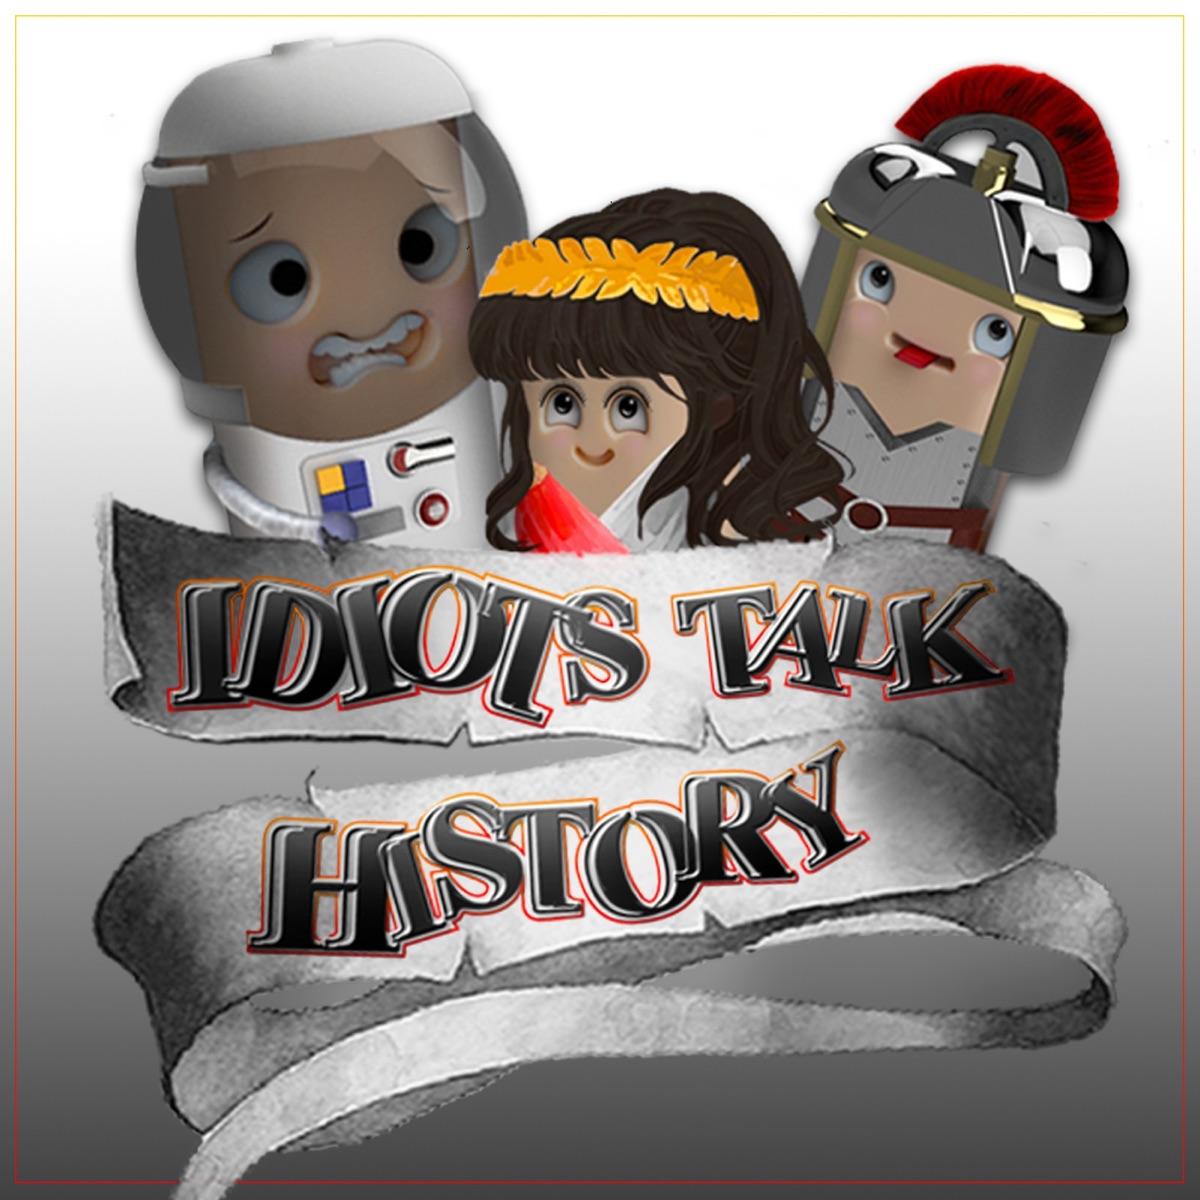 Idiots Talk History